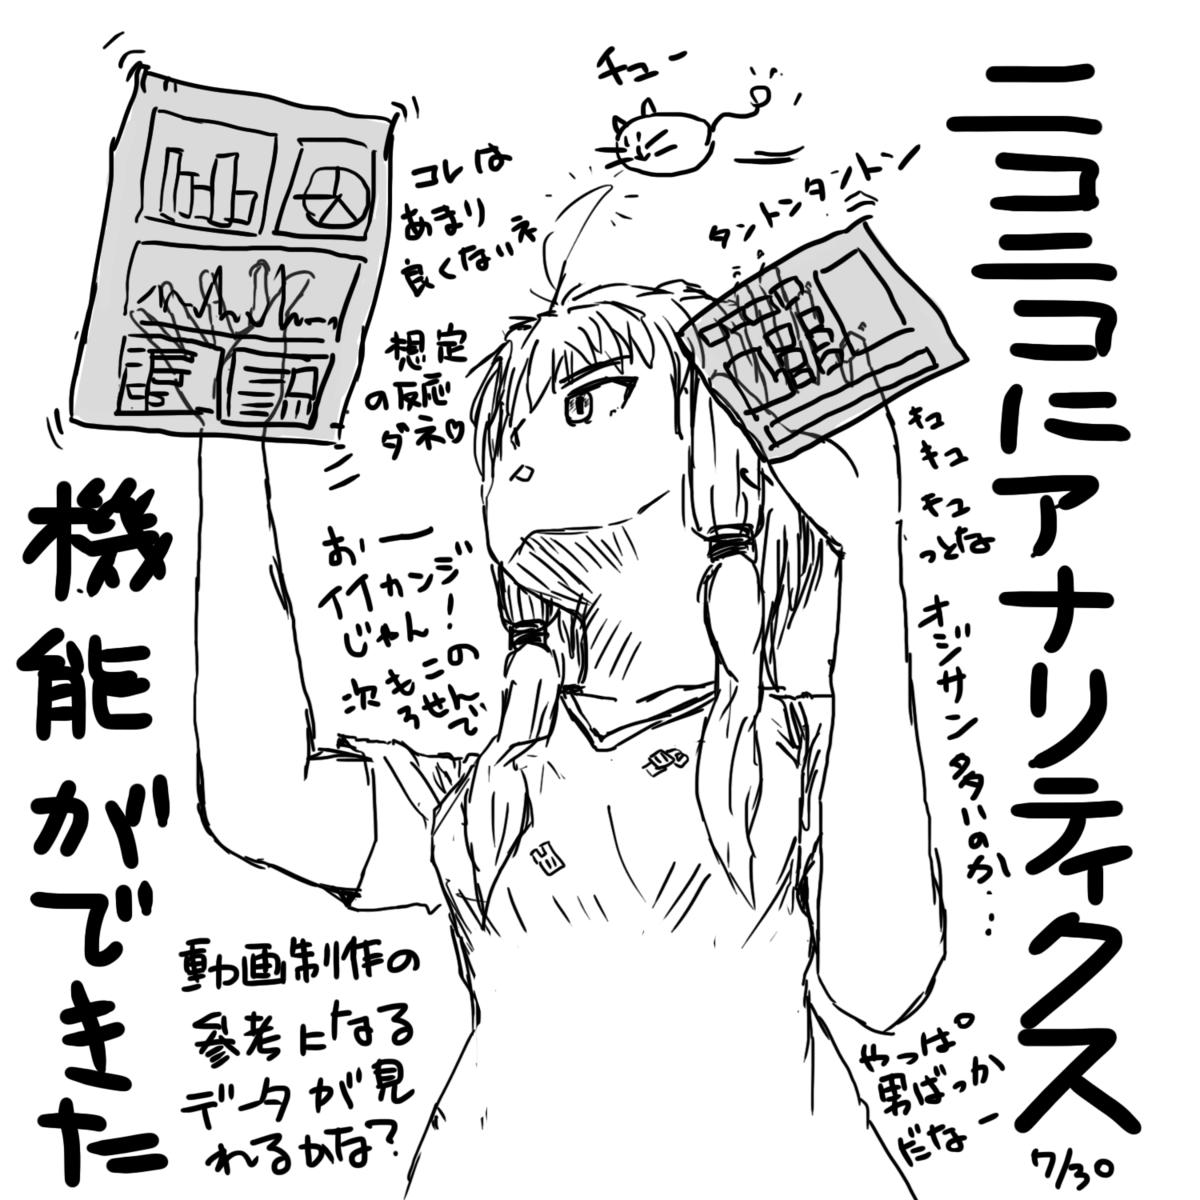 f:id:zomuzomu:20200730115824p:plain